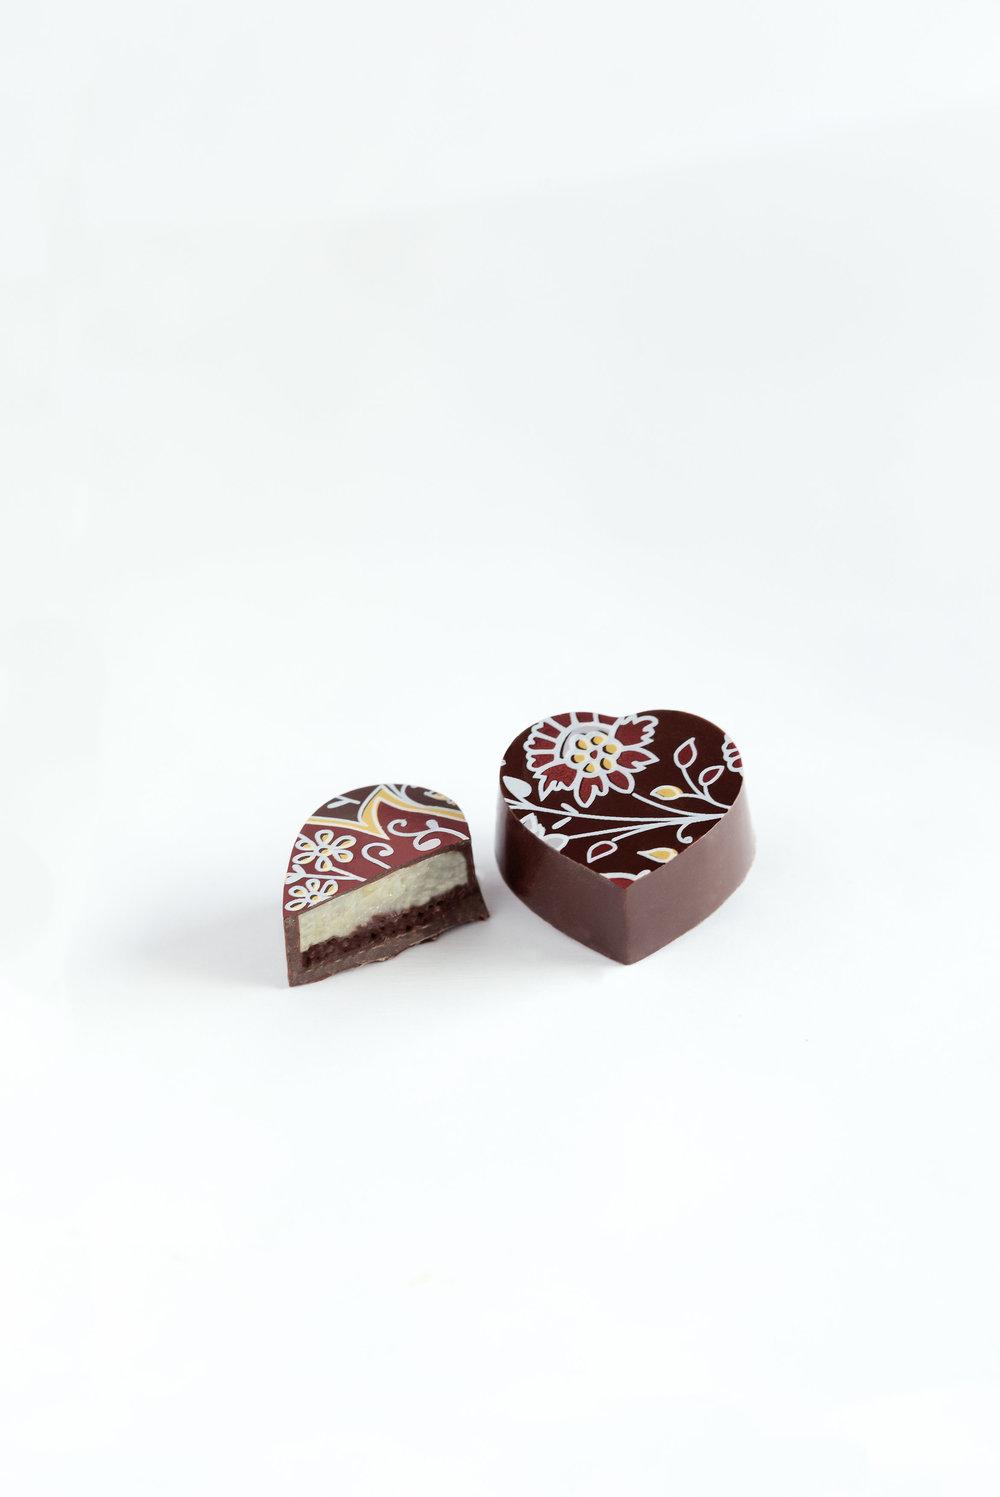 RomeoChocolates-ProductsImages-8722.jpg